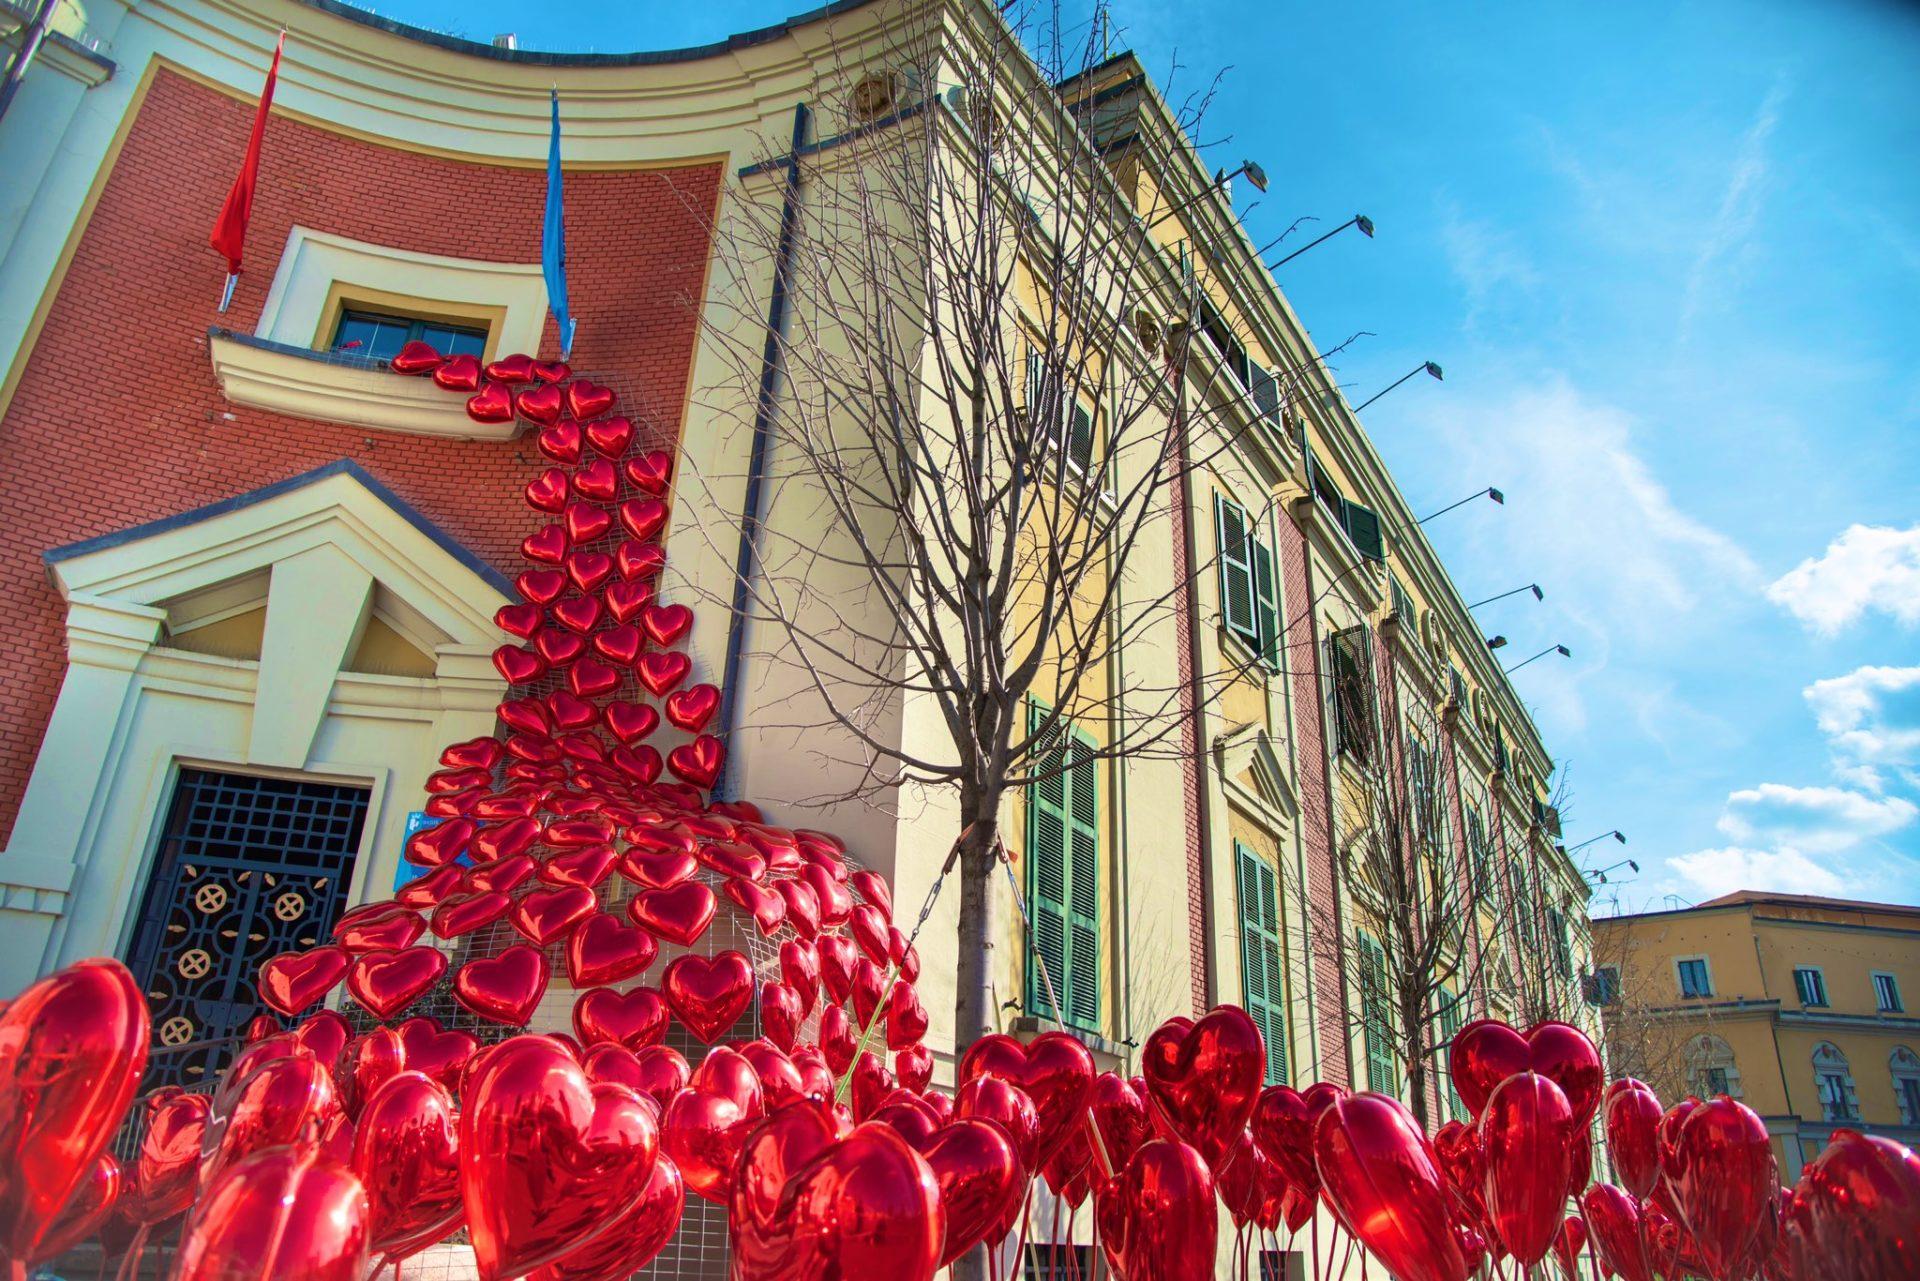 Auguri Di Natale In Albanese.Festivita In Albania